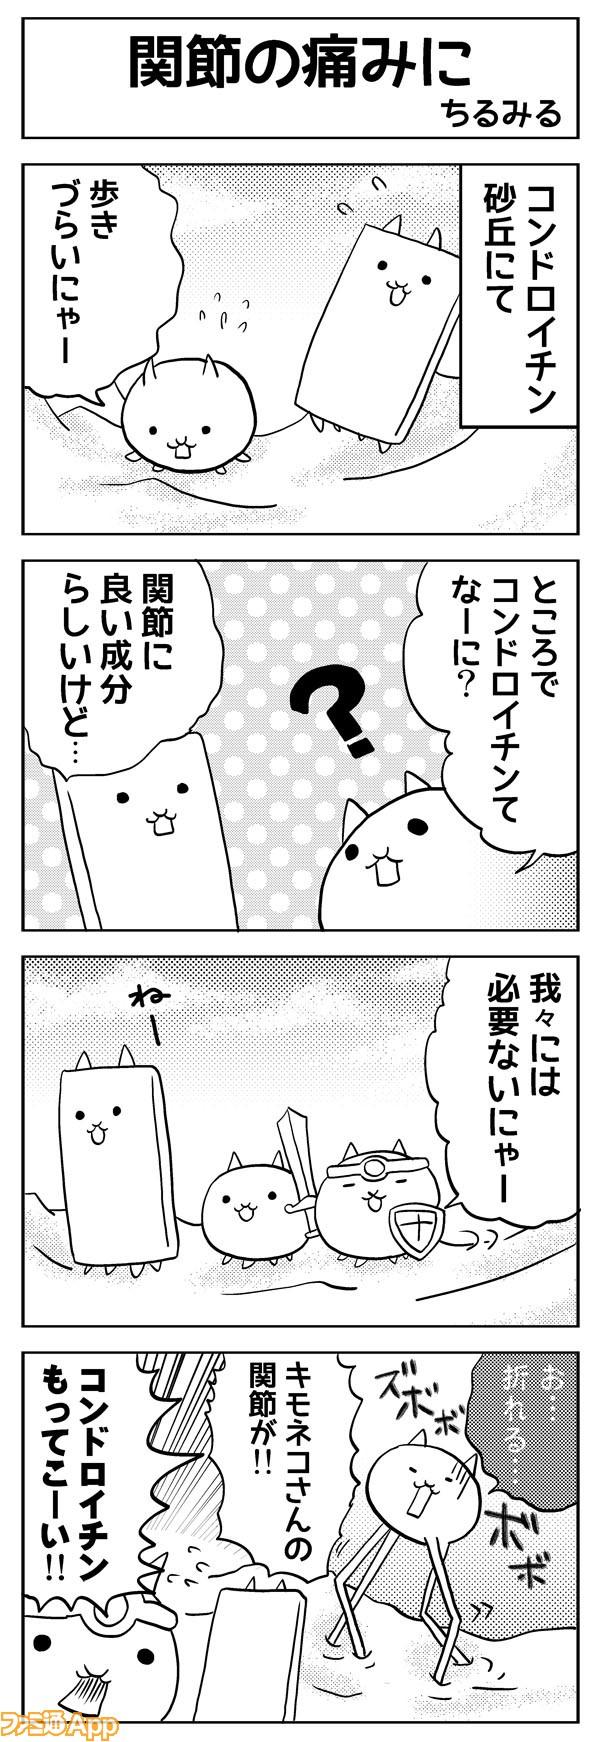 12chiru_008